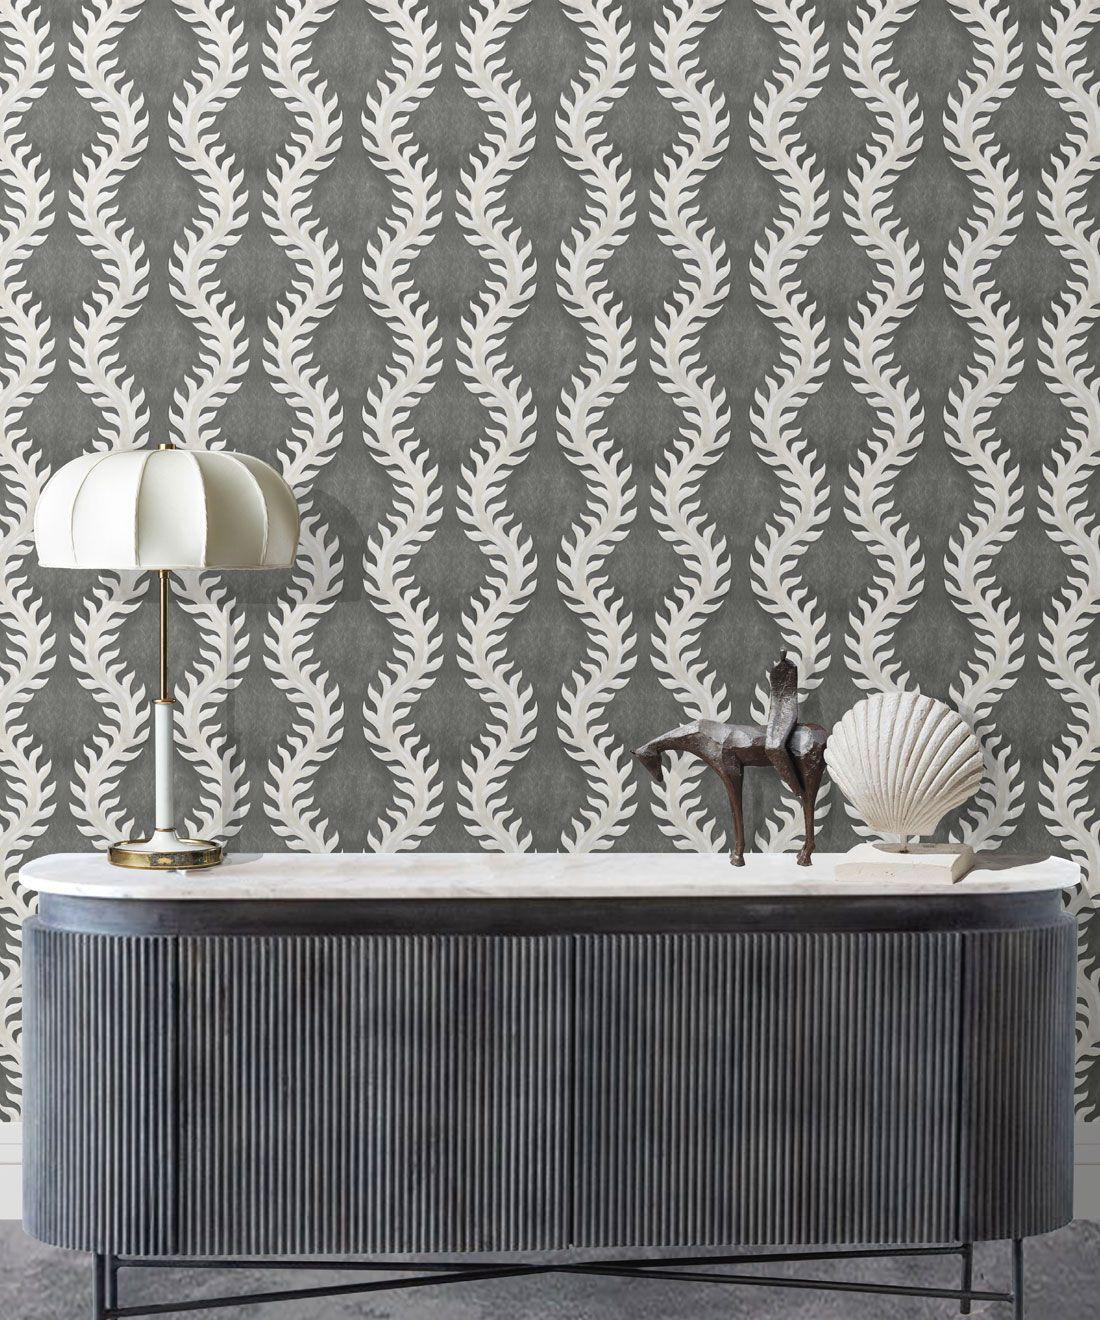 Fern Wallpaper • Gray Wallpaper •Insitu with desk